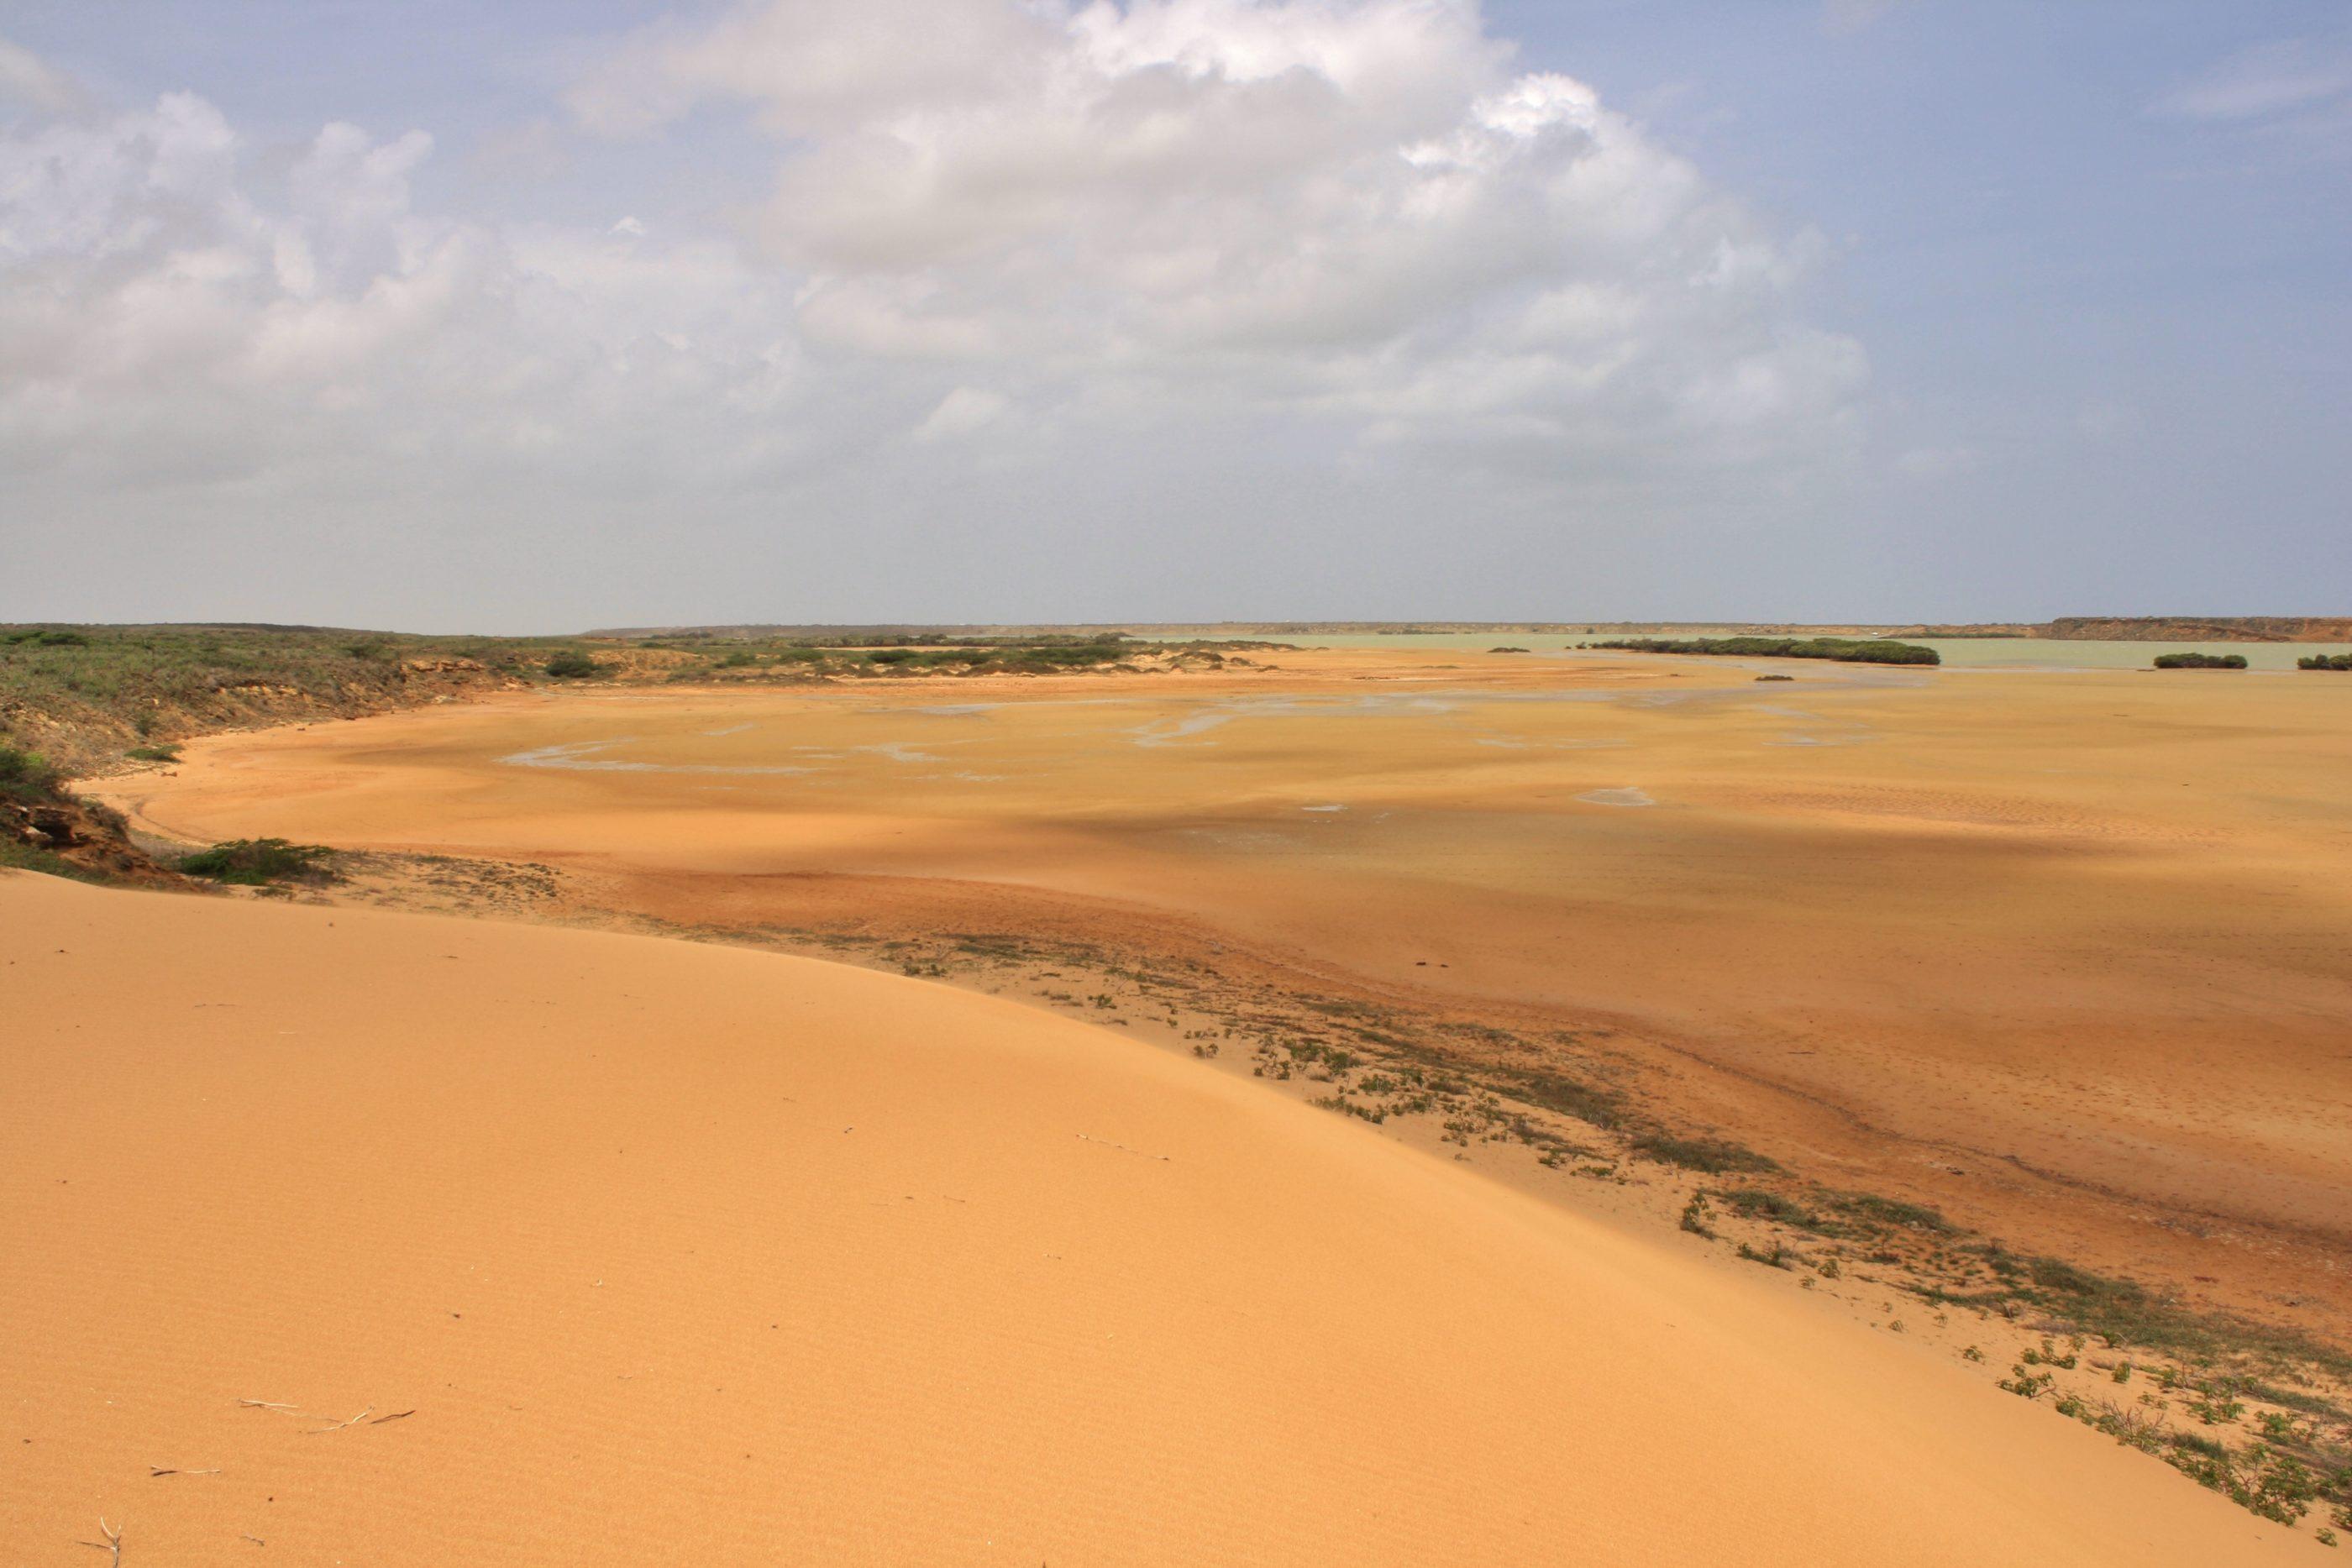 Bahía Hondita - Punta Gallinas - La Guajira